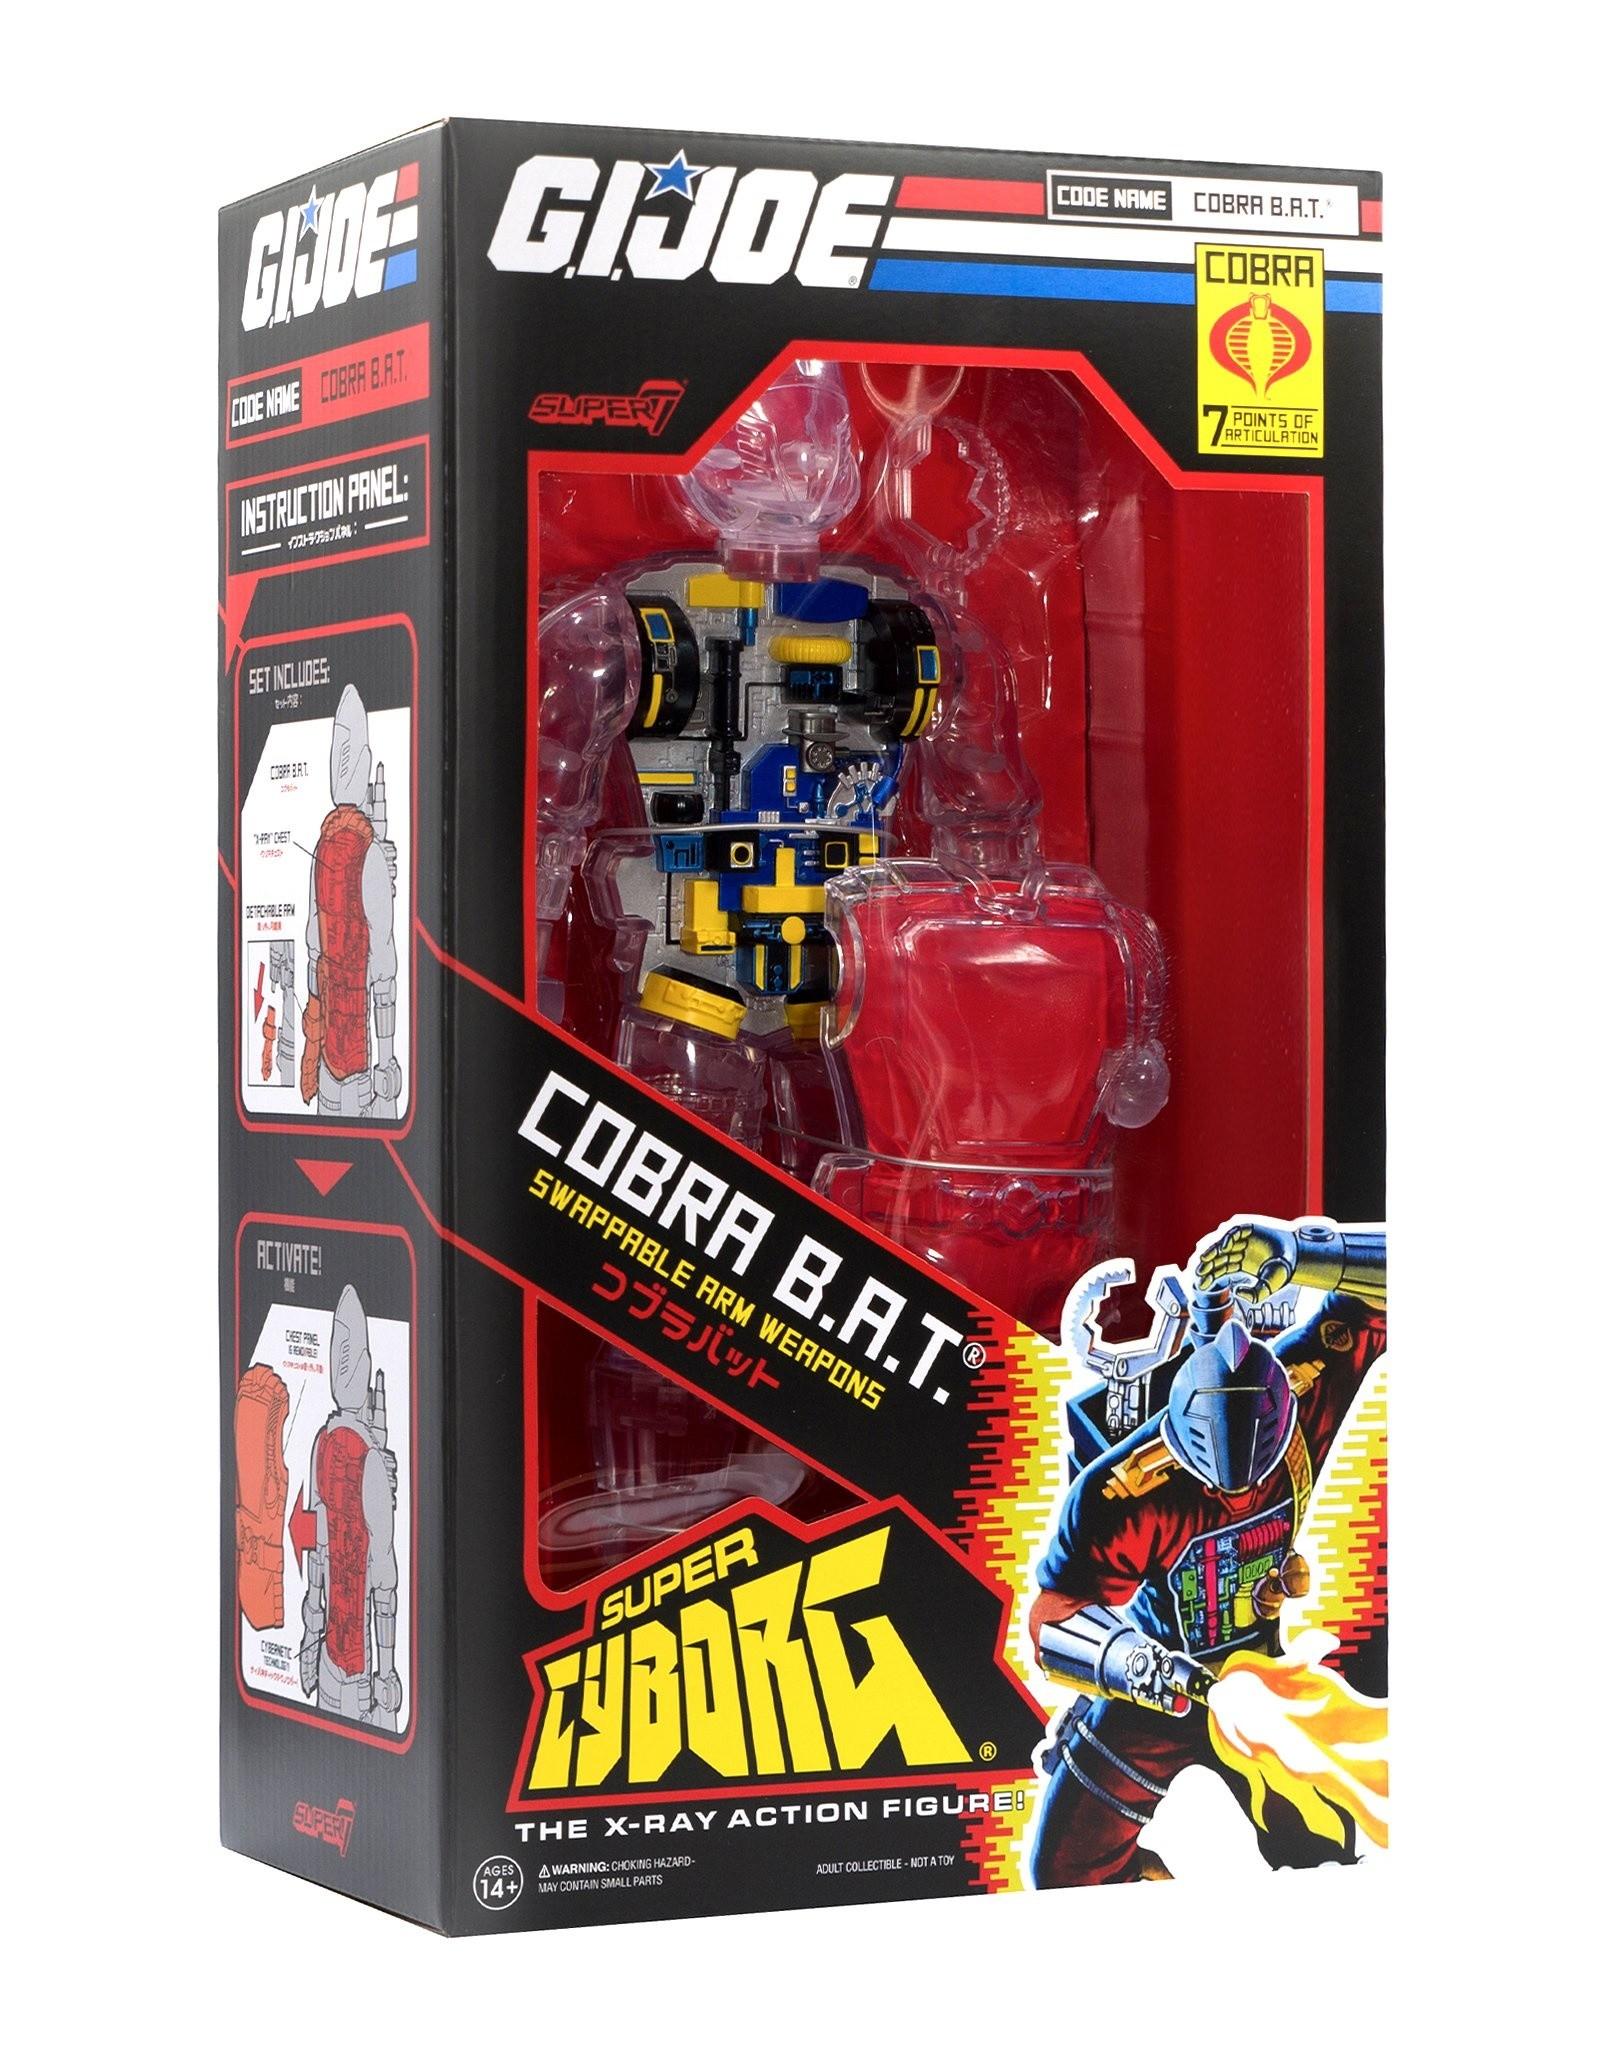 SUPER7 G.I. Joe: Cobra B.A.T. Super Cyborg (Clear Vinyl Figure) 2021